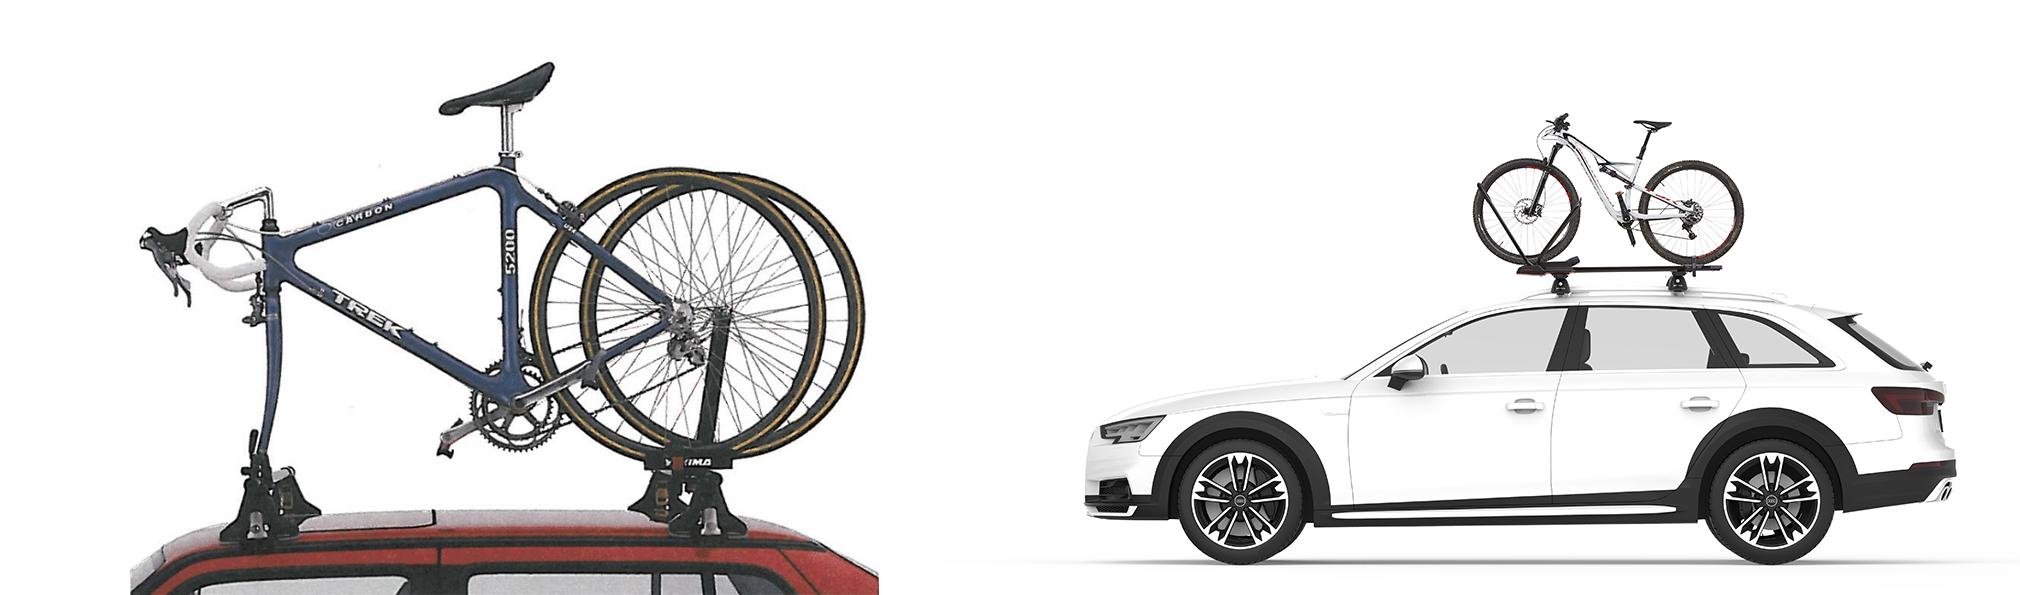 Yakima bike racks - then and now